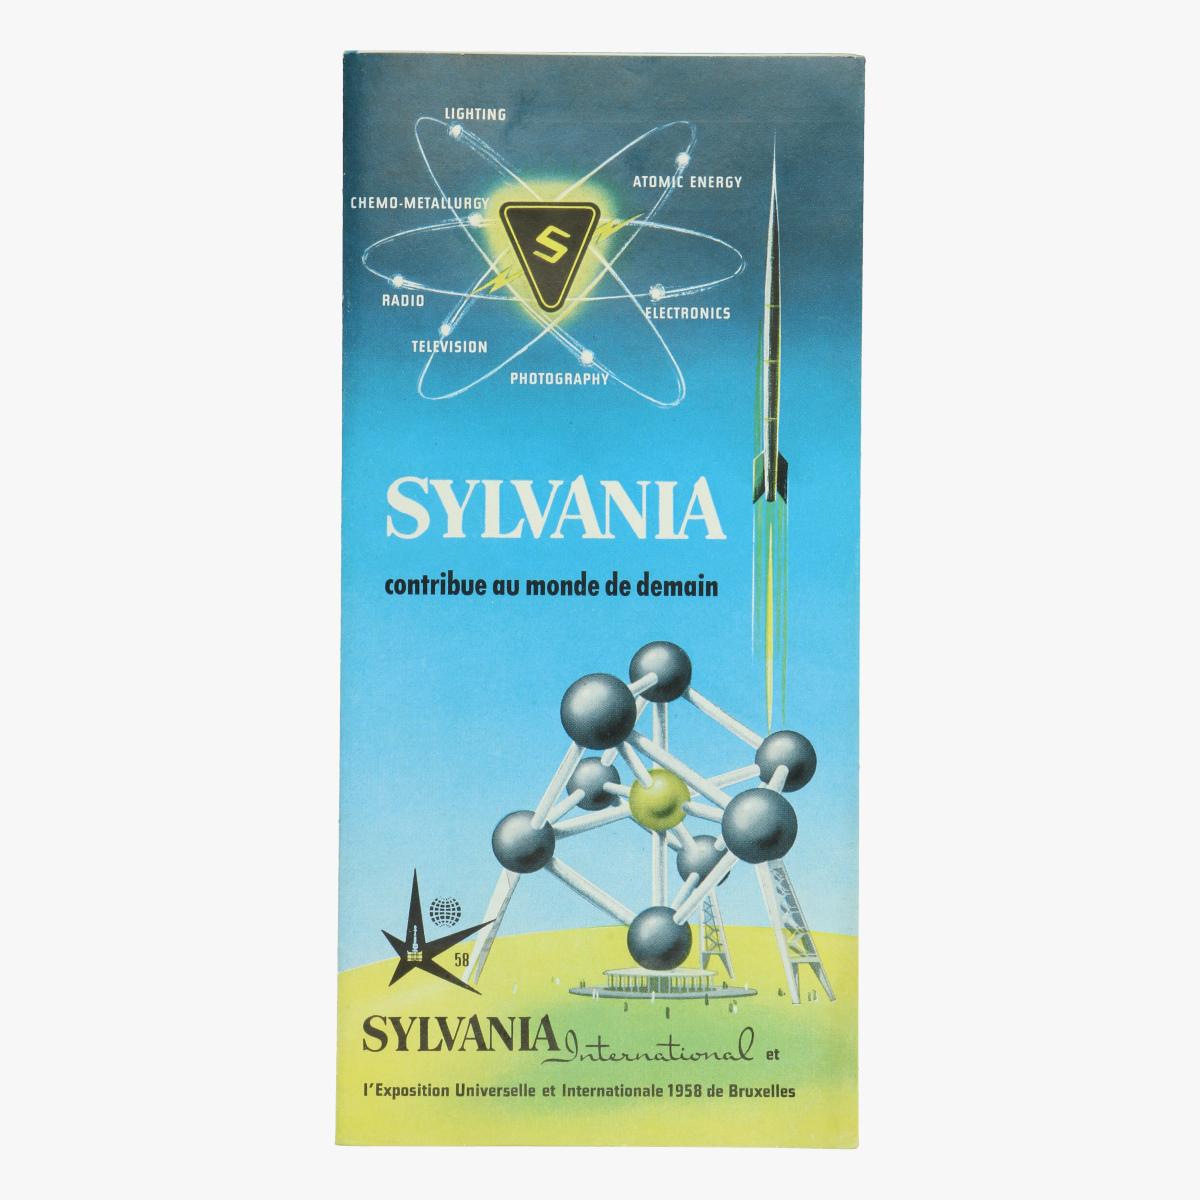 Afbeeldingen van expo 58 sylvania contribue au monde de demain